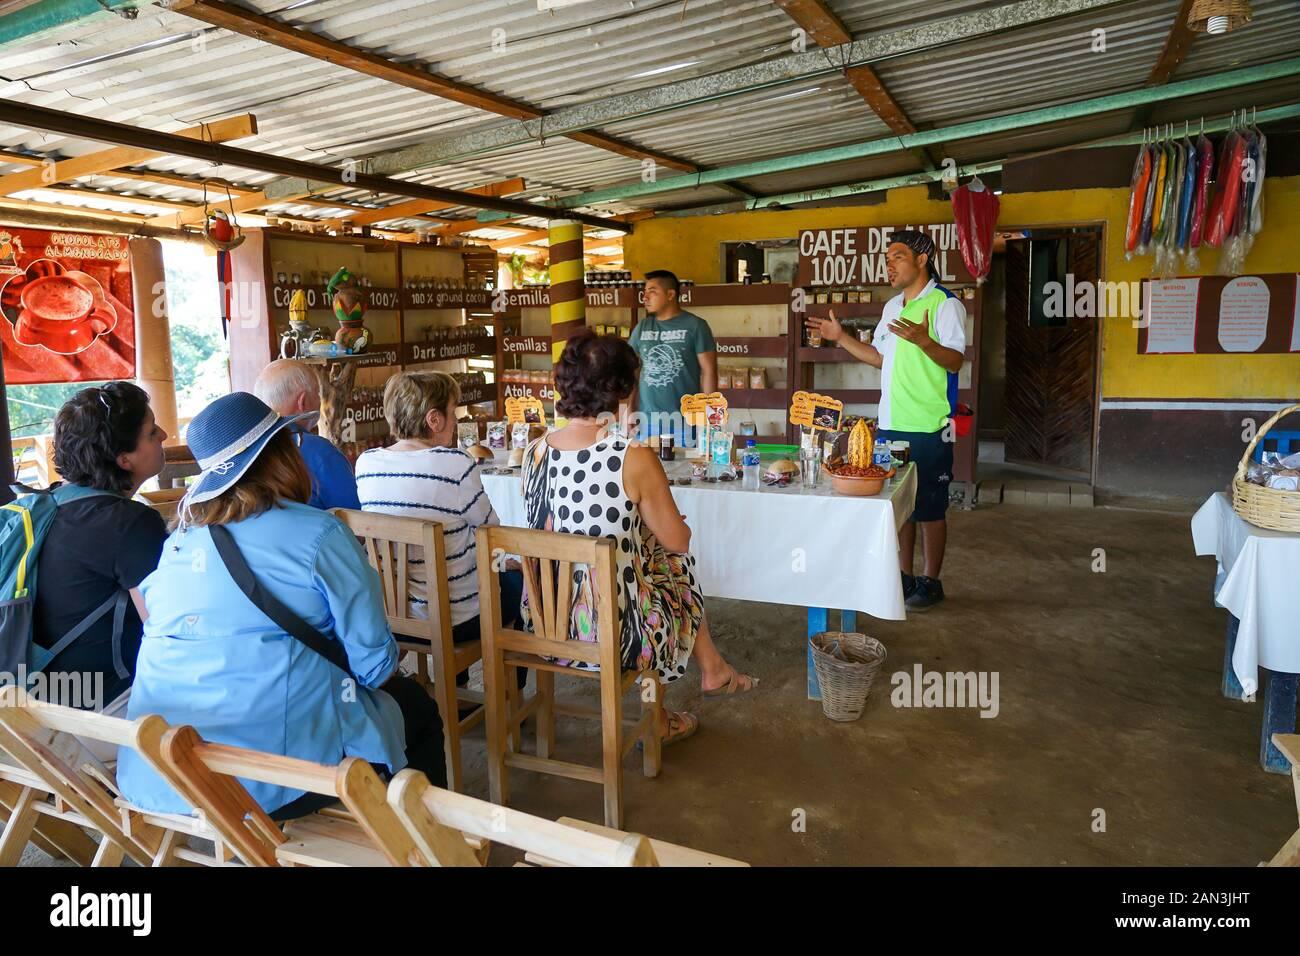 Fábrica De Chocolate Artesanal En. Mazunte, Huatulco, México, Bahía De Huatulco, Foto de stock